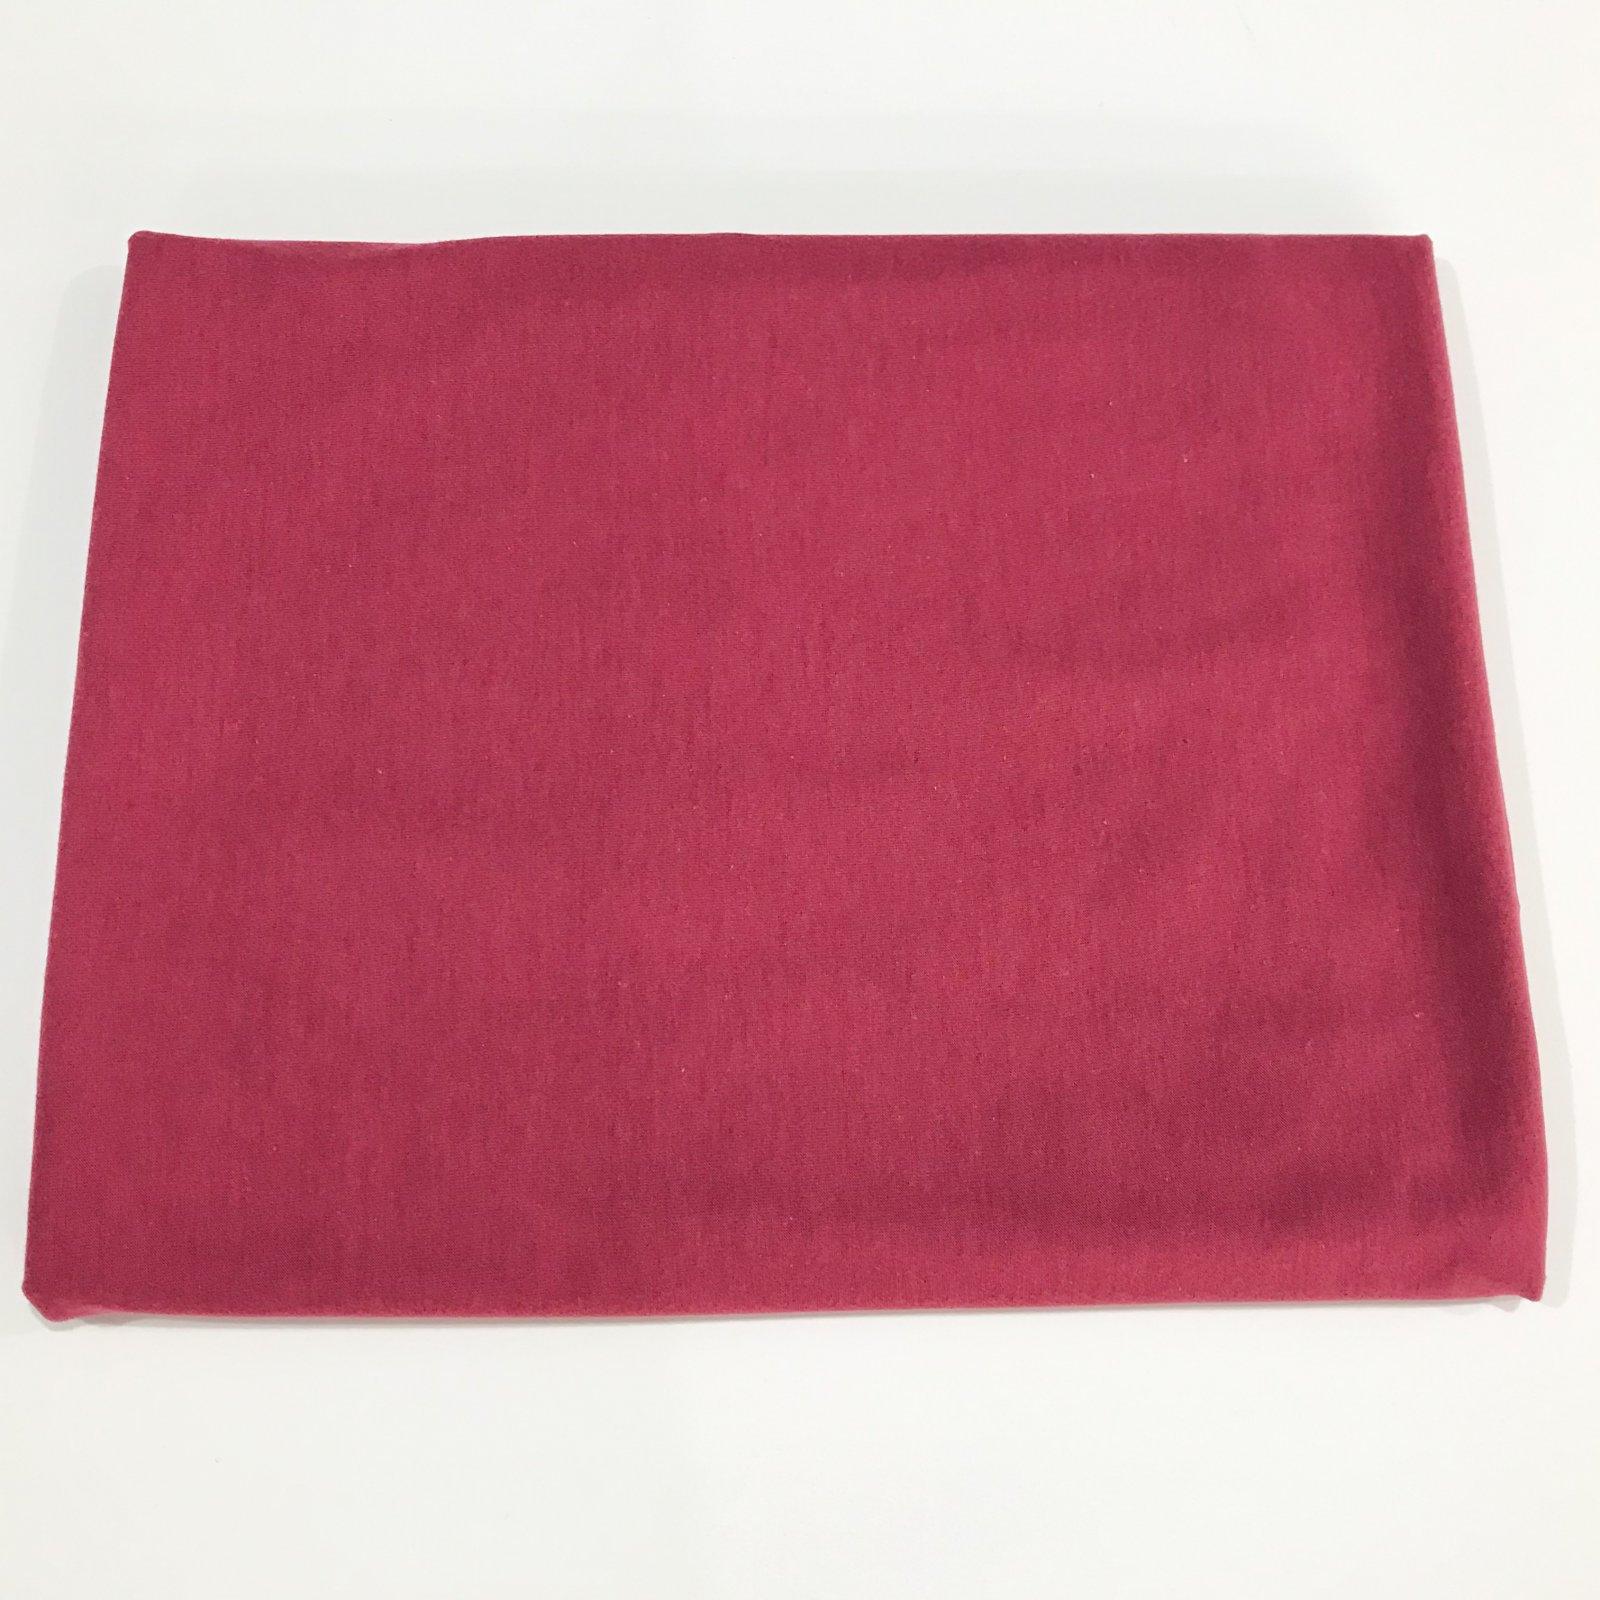 1 1/2 yard - Cotton-Modal Knit - Dark Rose